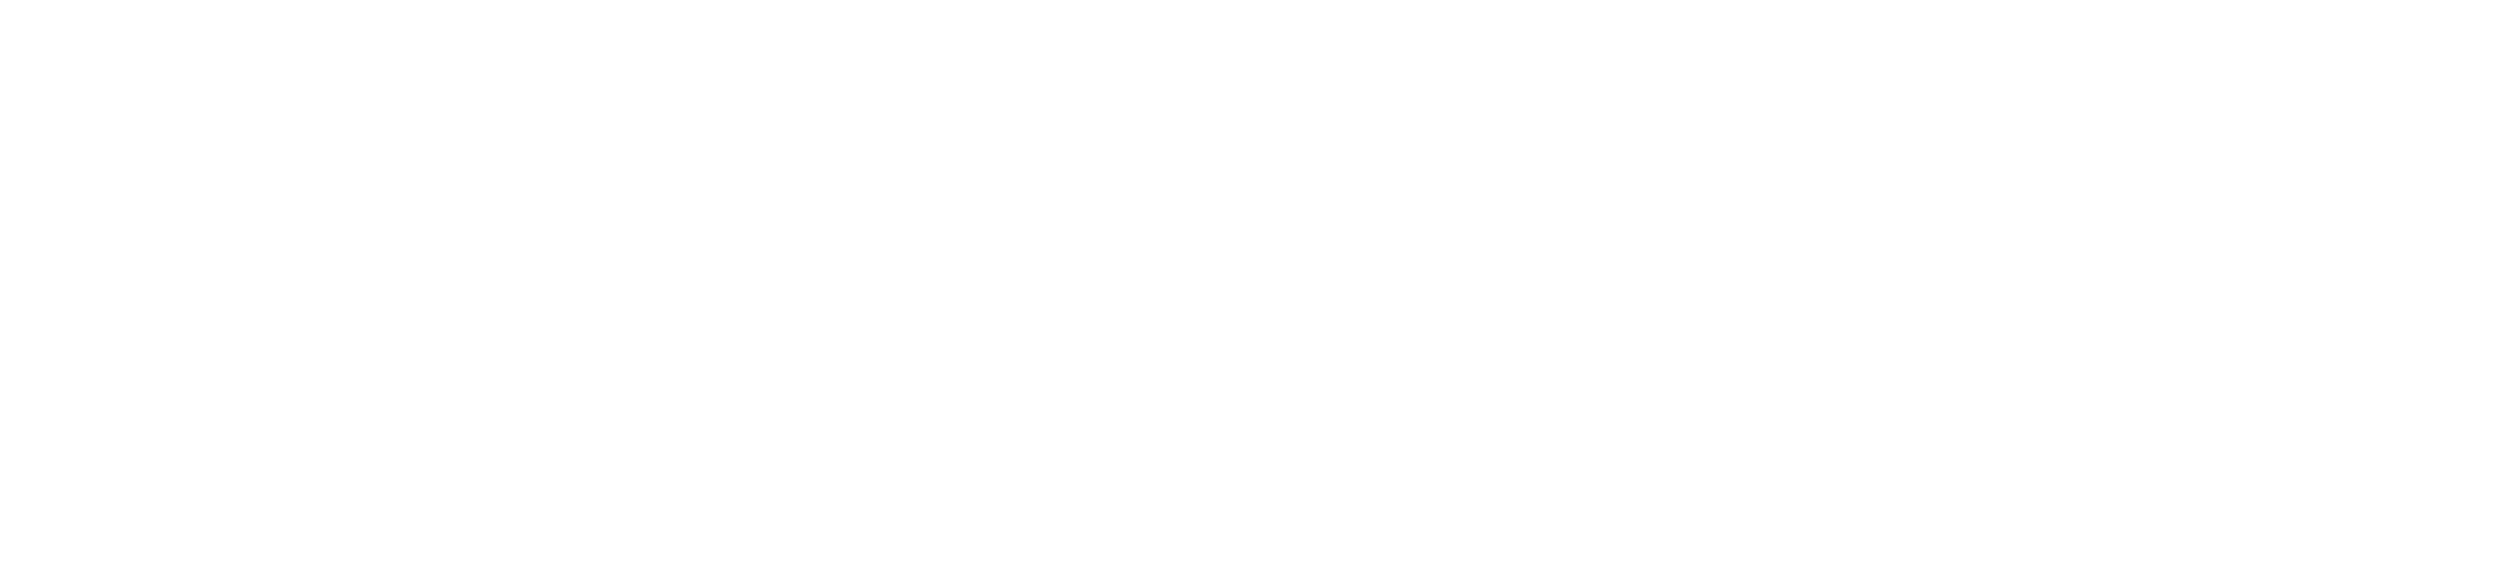 FT_LOCKUP (1).png